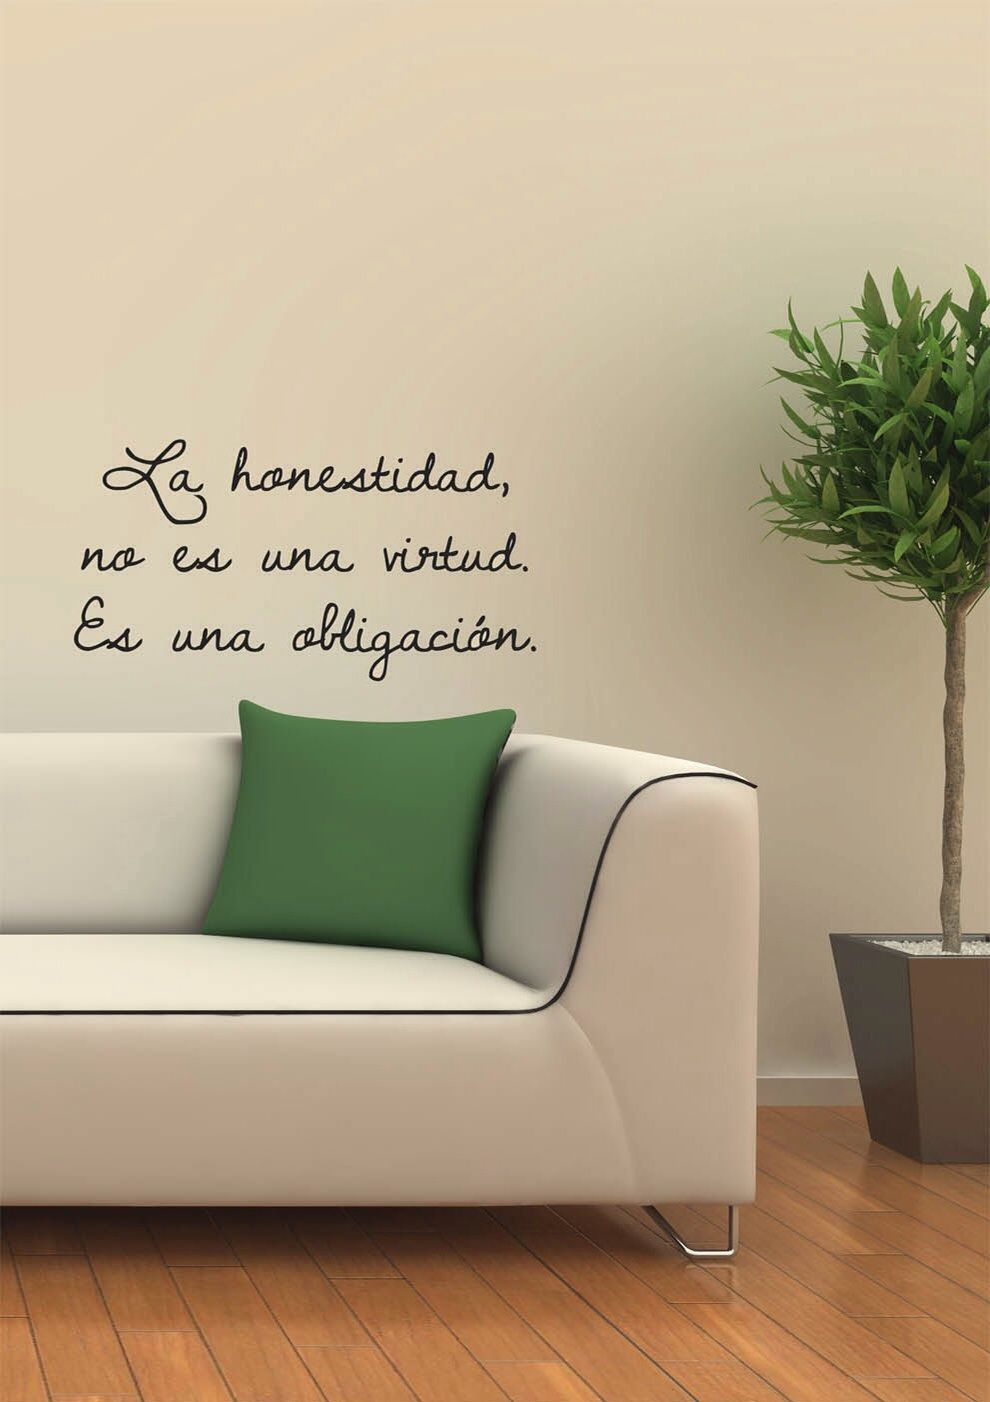 vinilo decorativo para paredes